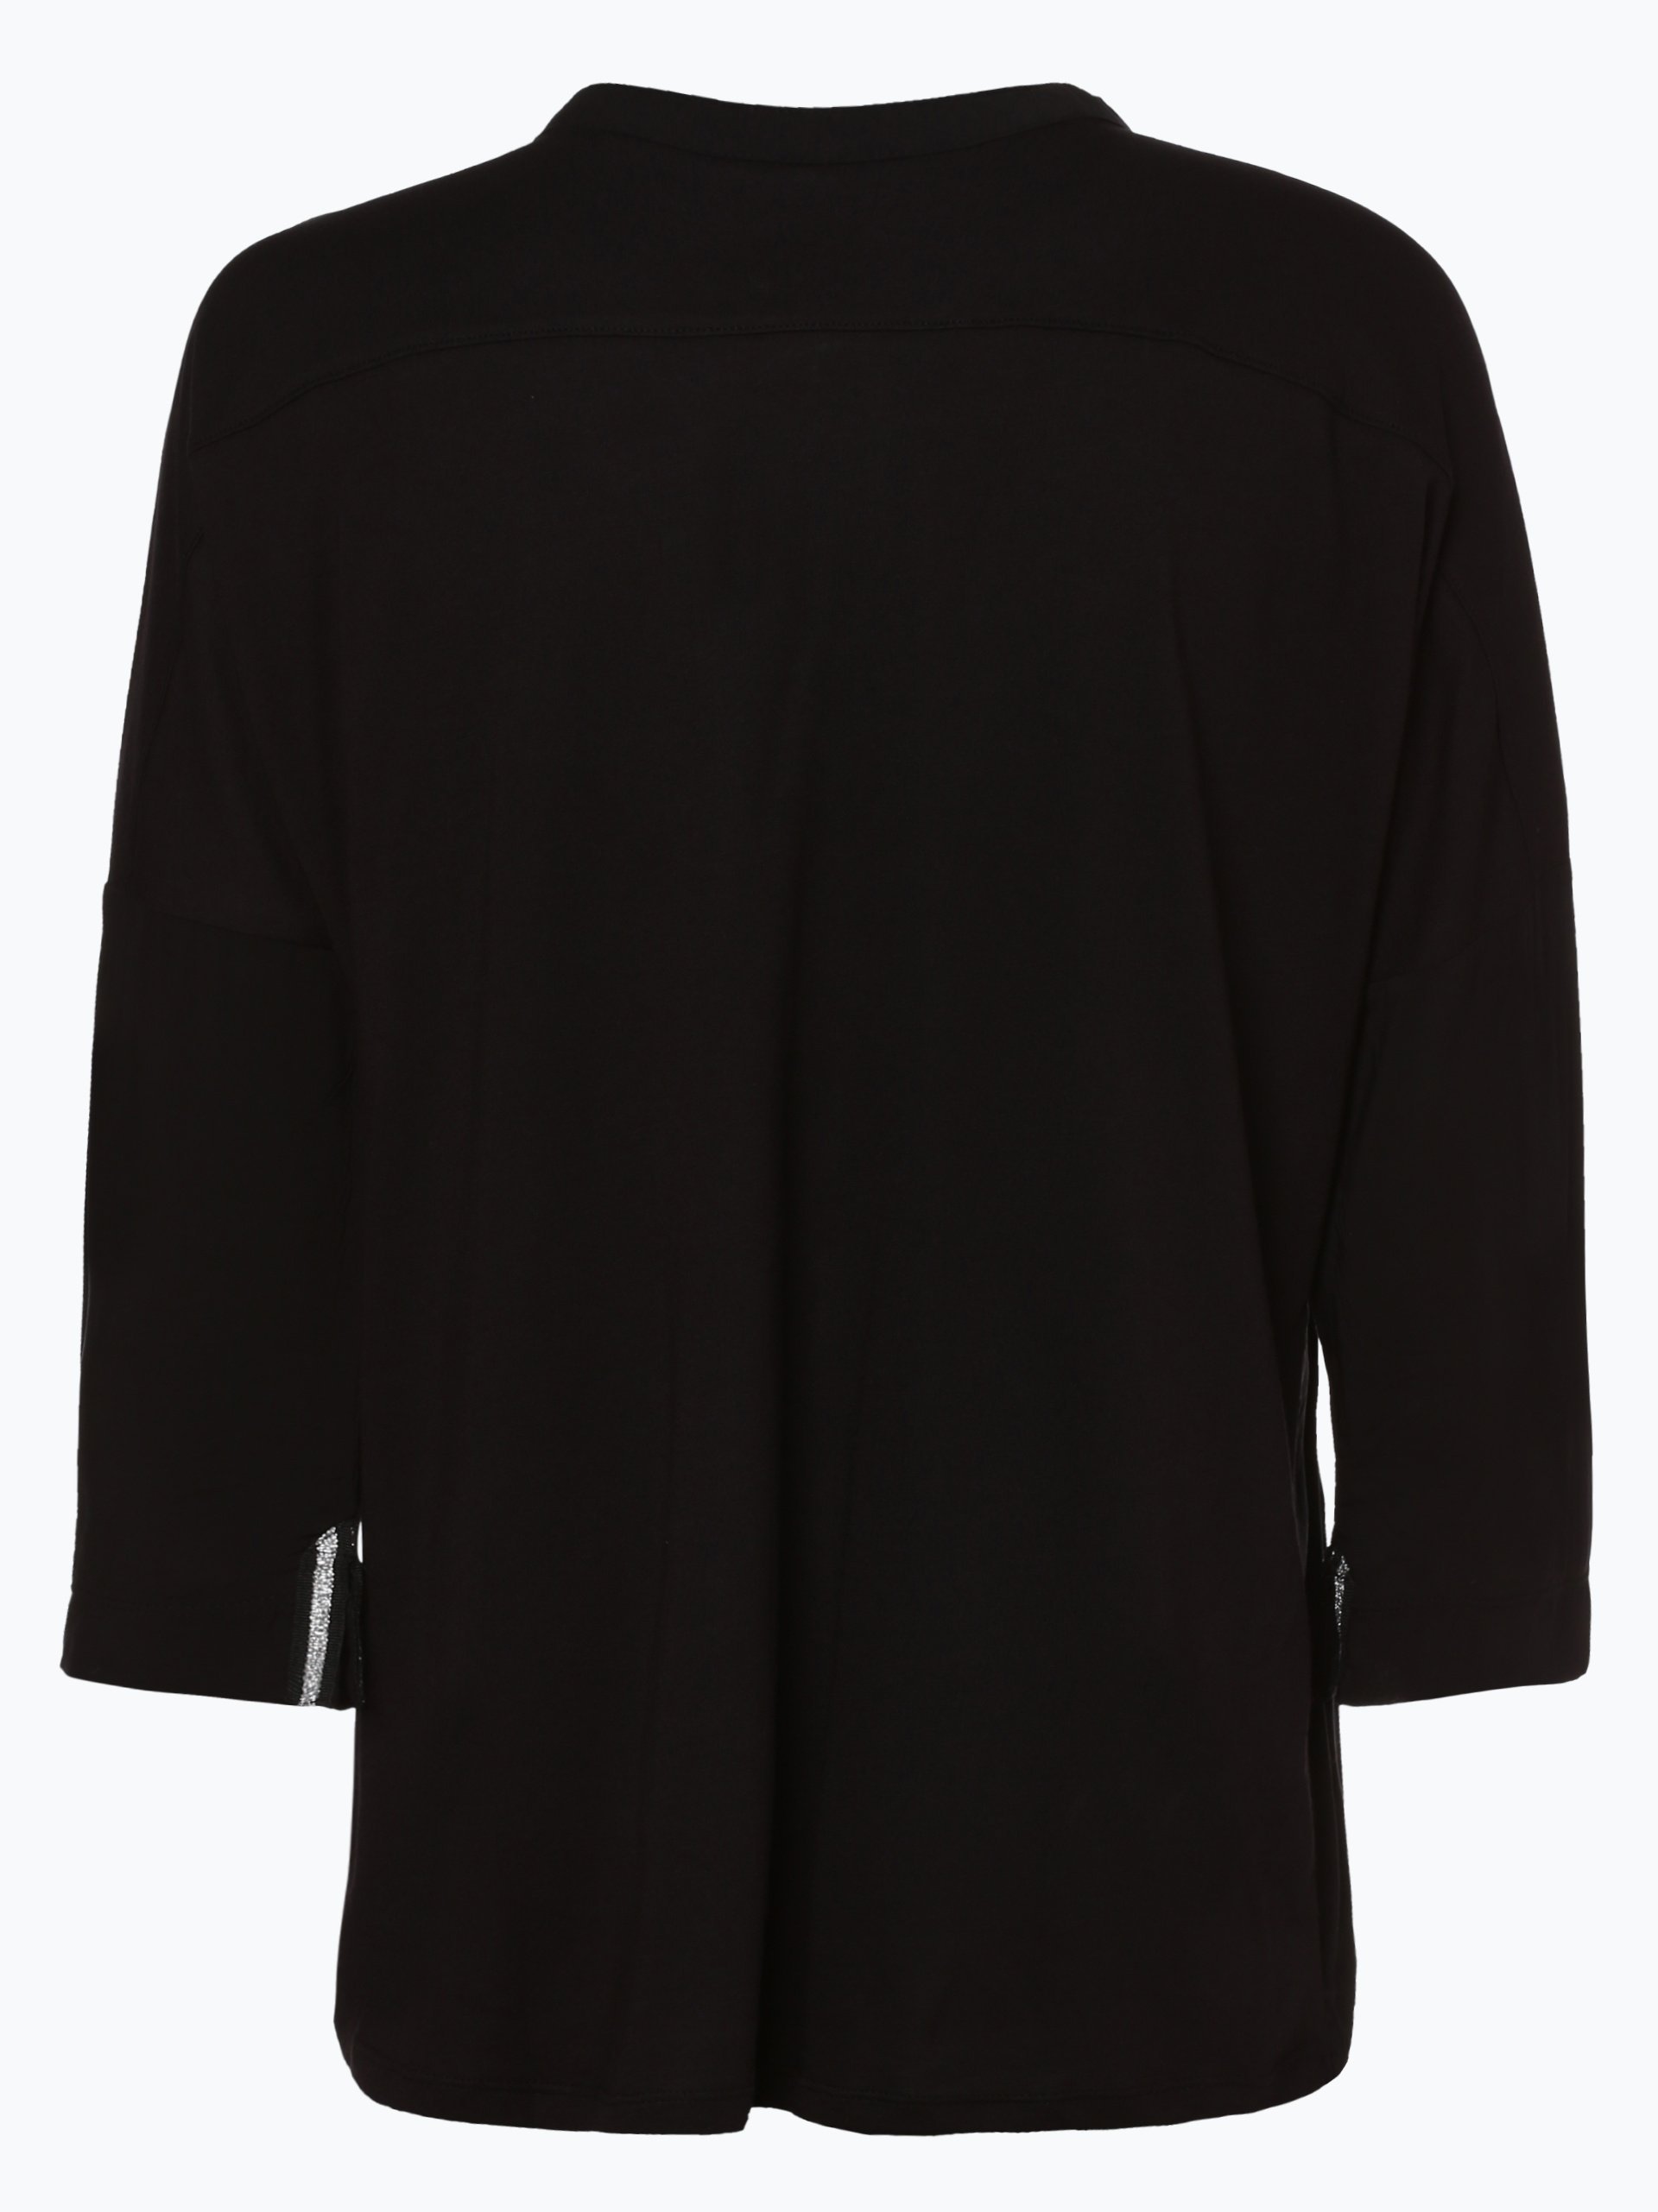 Key Largo Damen T-Shirt - Sabrina